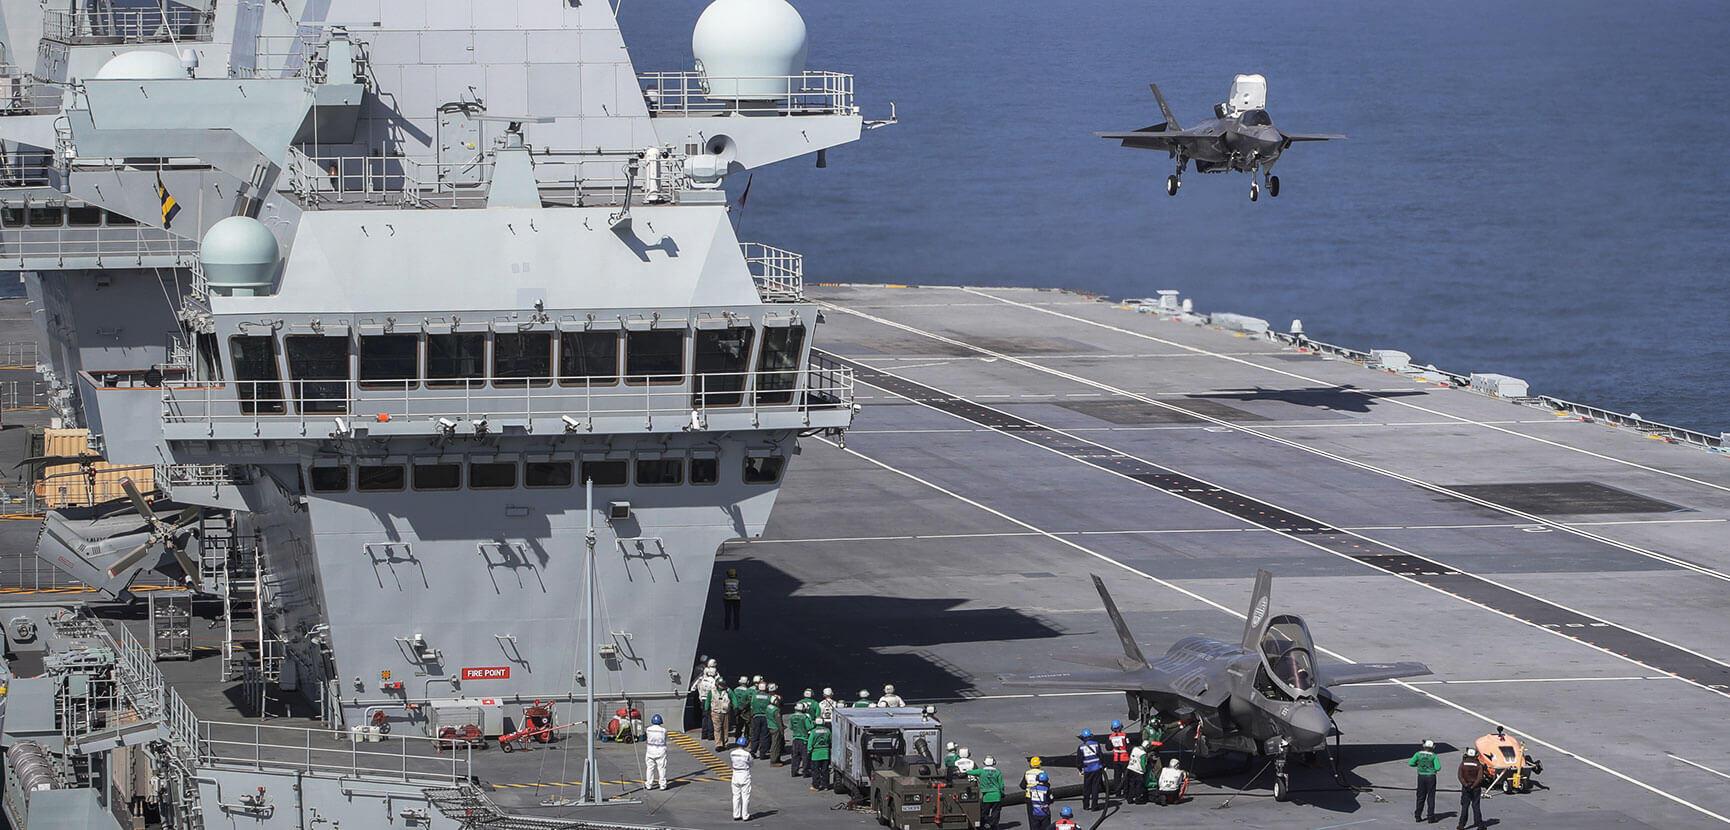 Fast jets on deck. F-35 arrives on HMS Queen Elizabeth